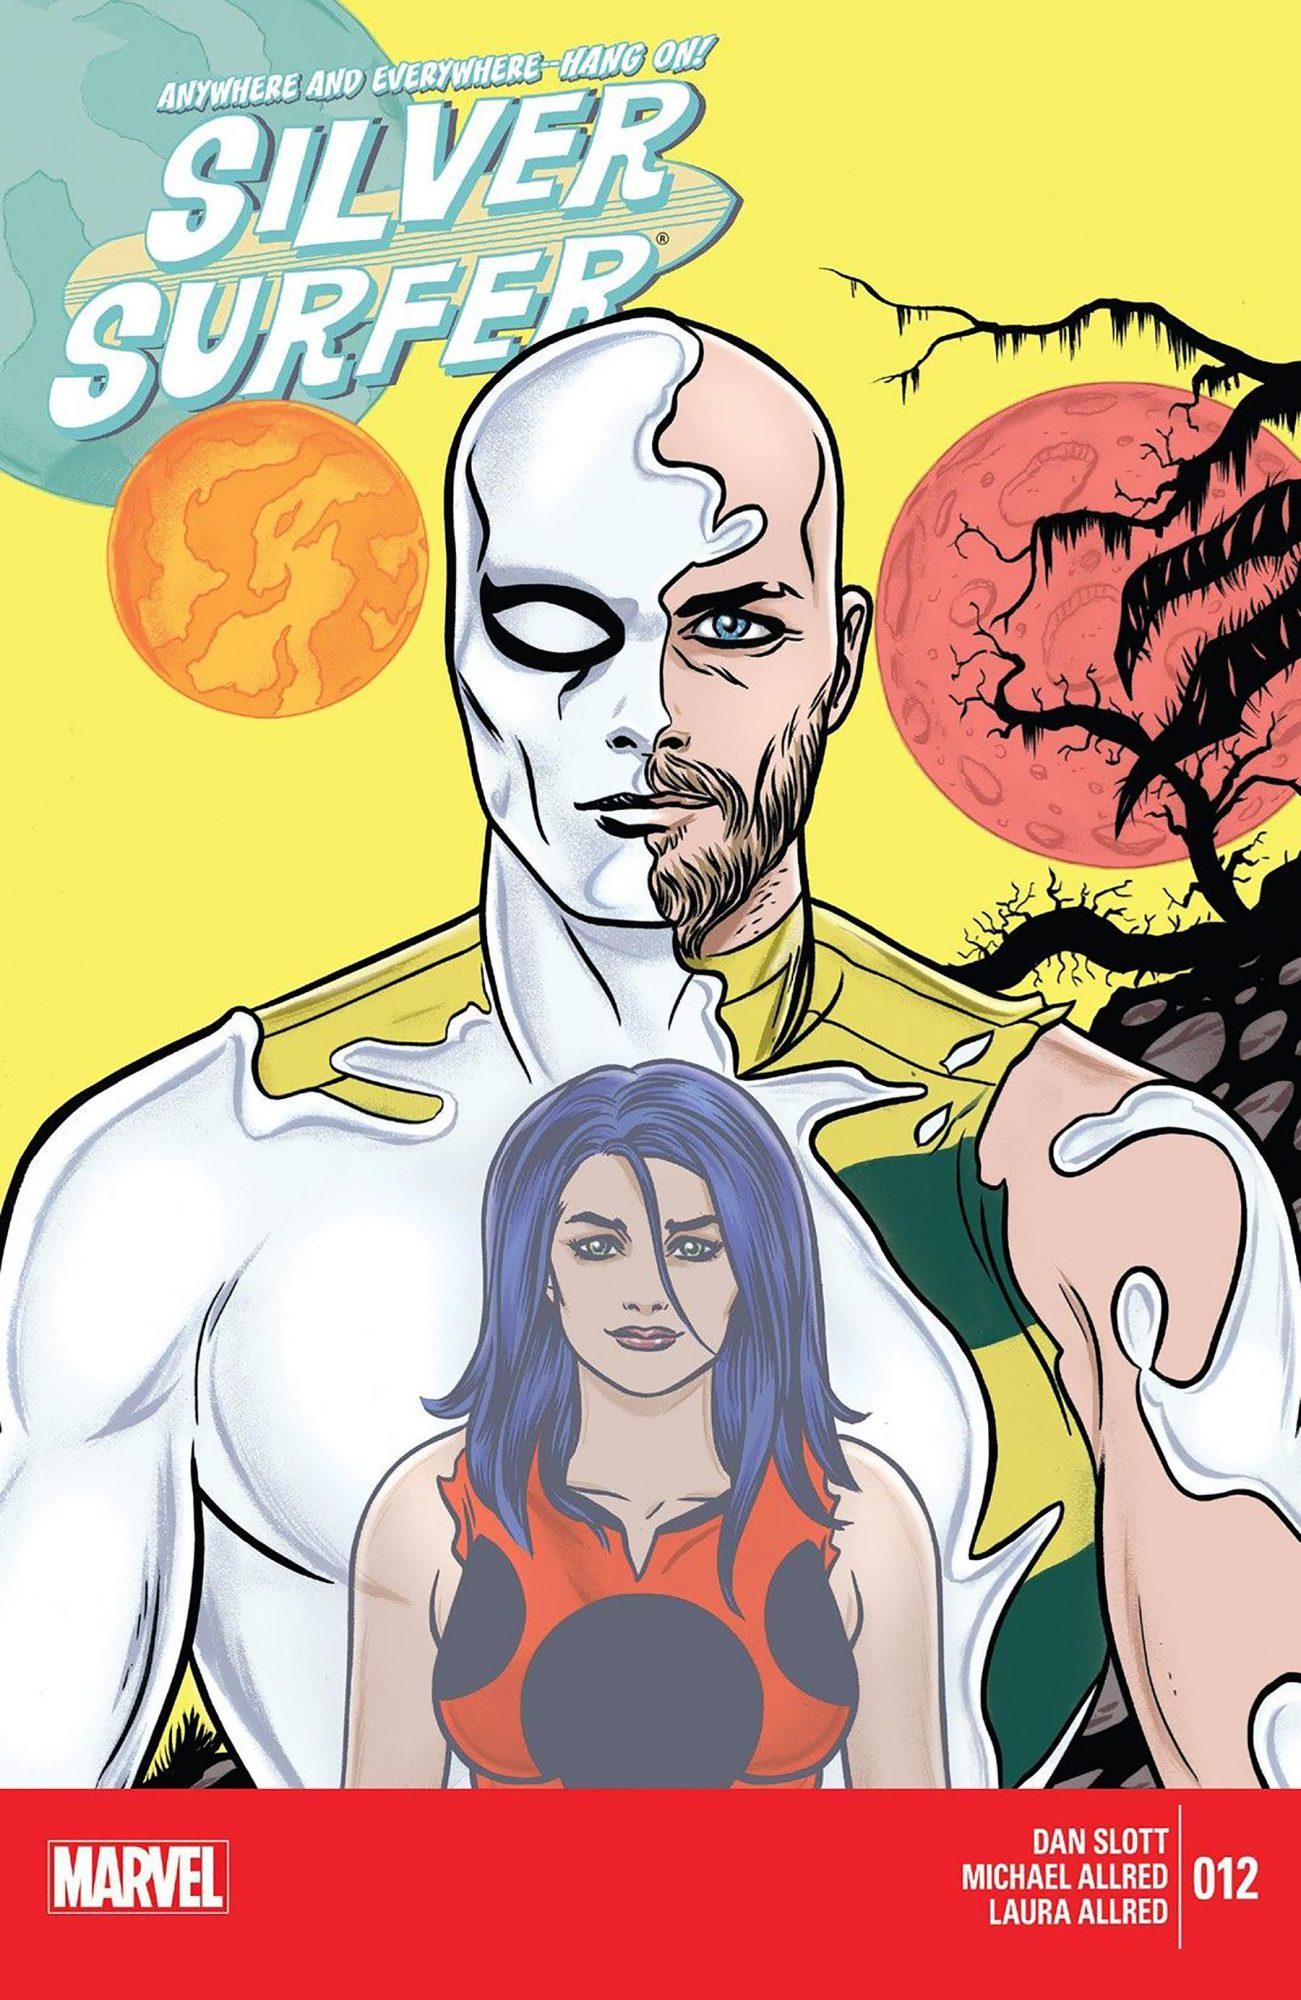 Silver Surfer #12 CR: Marvel